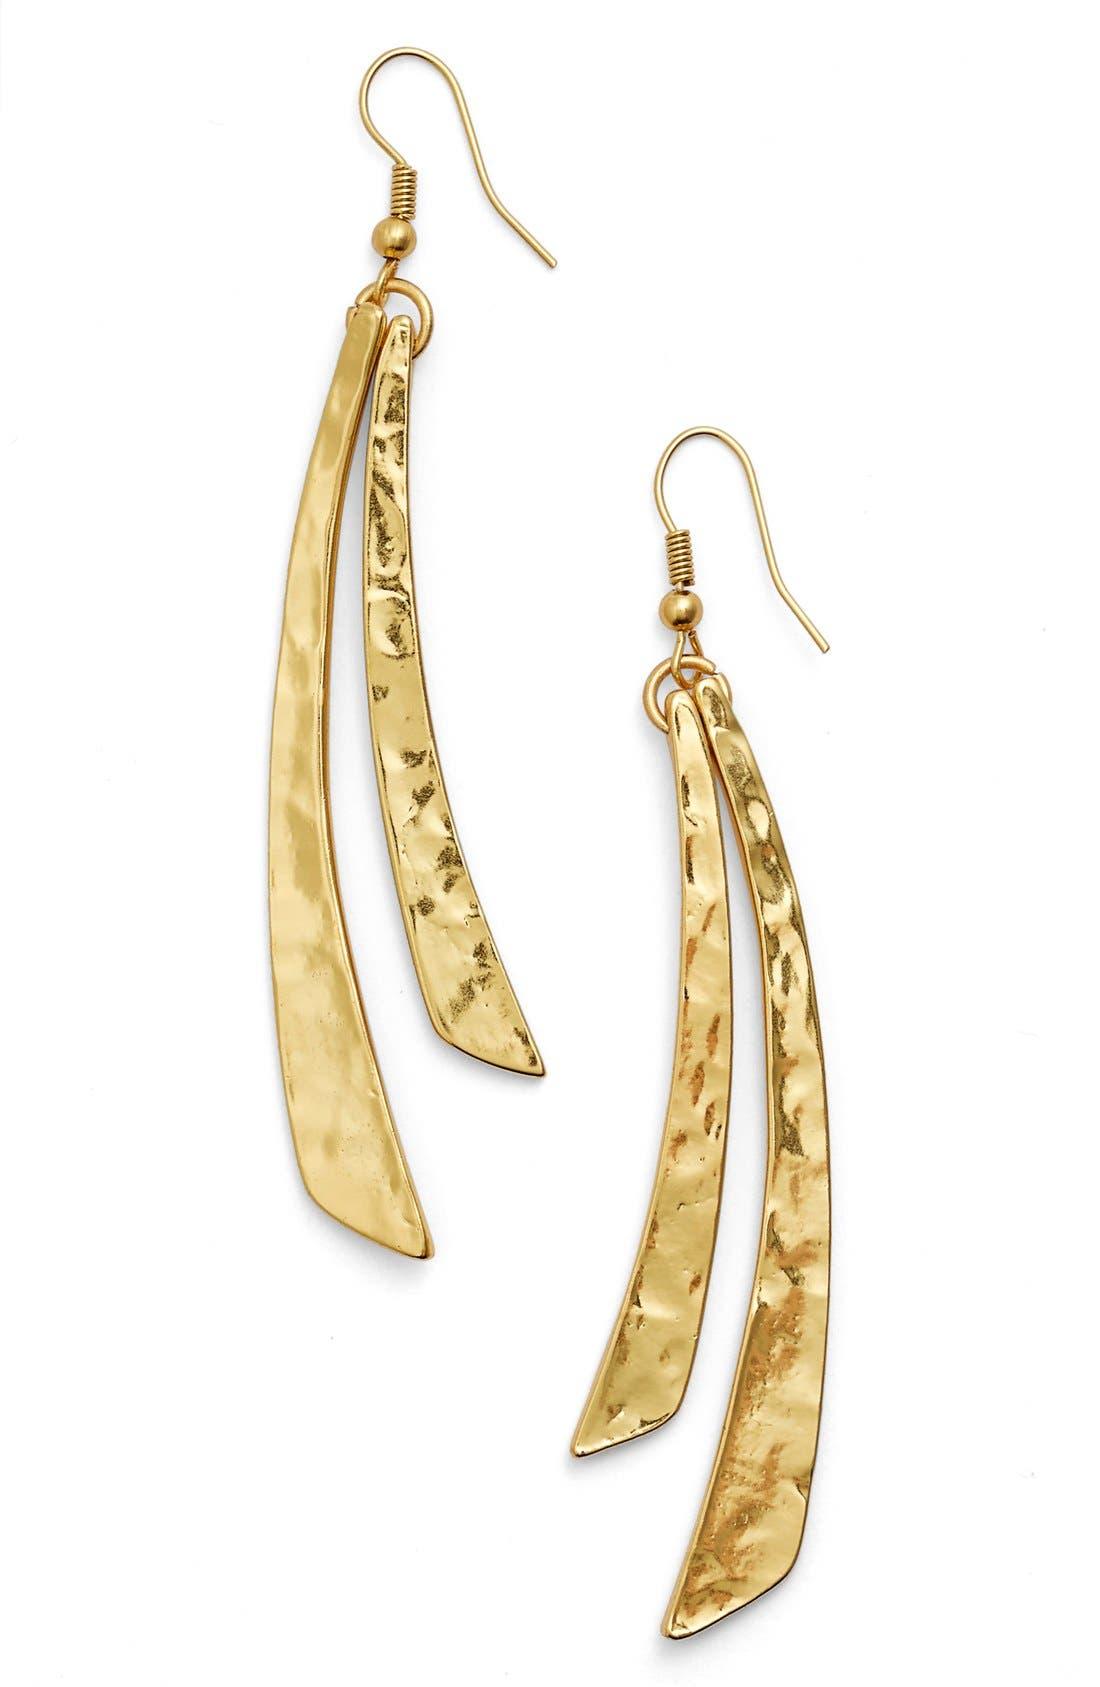 Main Image - Karine Sultan 'Two Stick' Drop Earrings